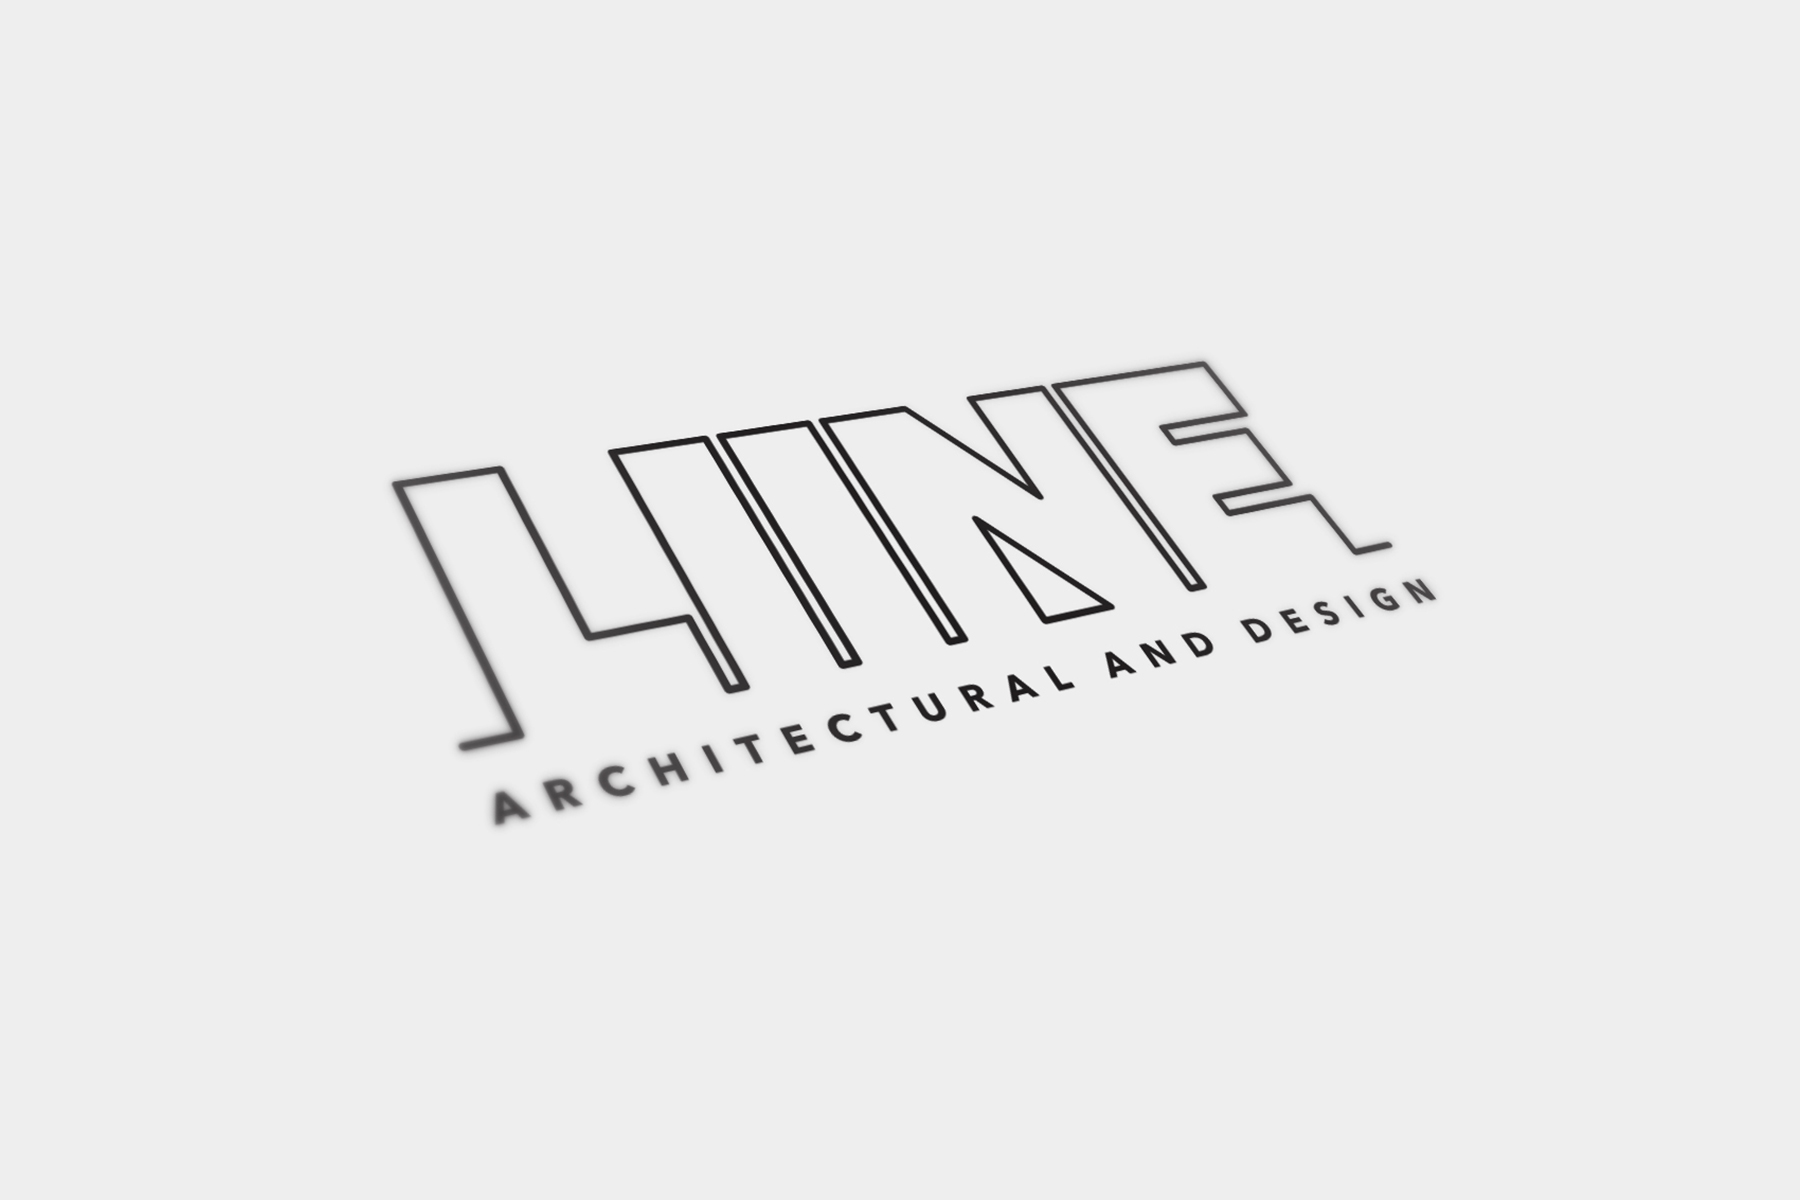 Liine Architectural and Design logo